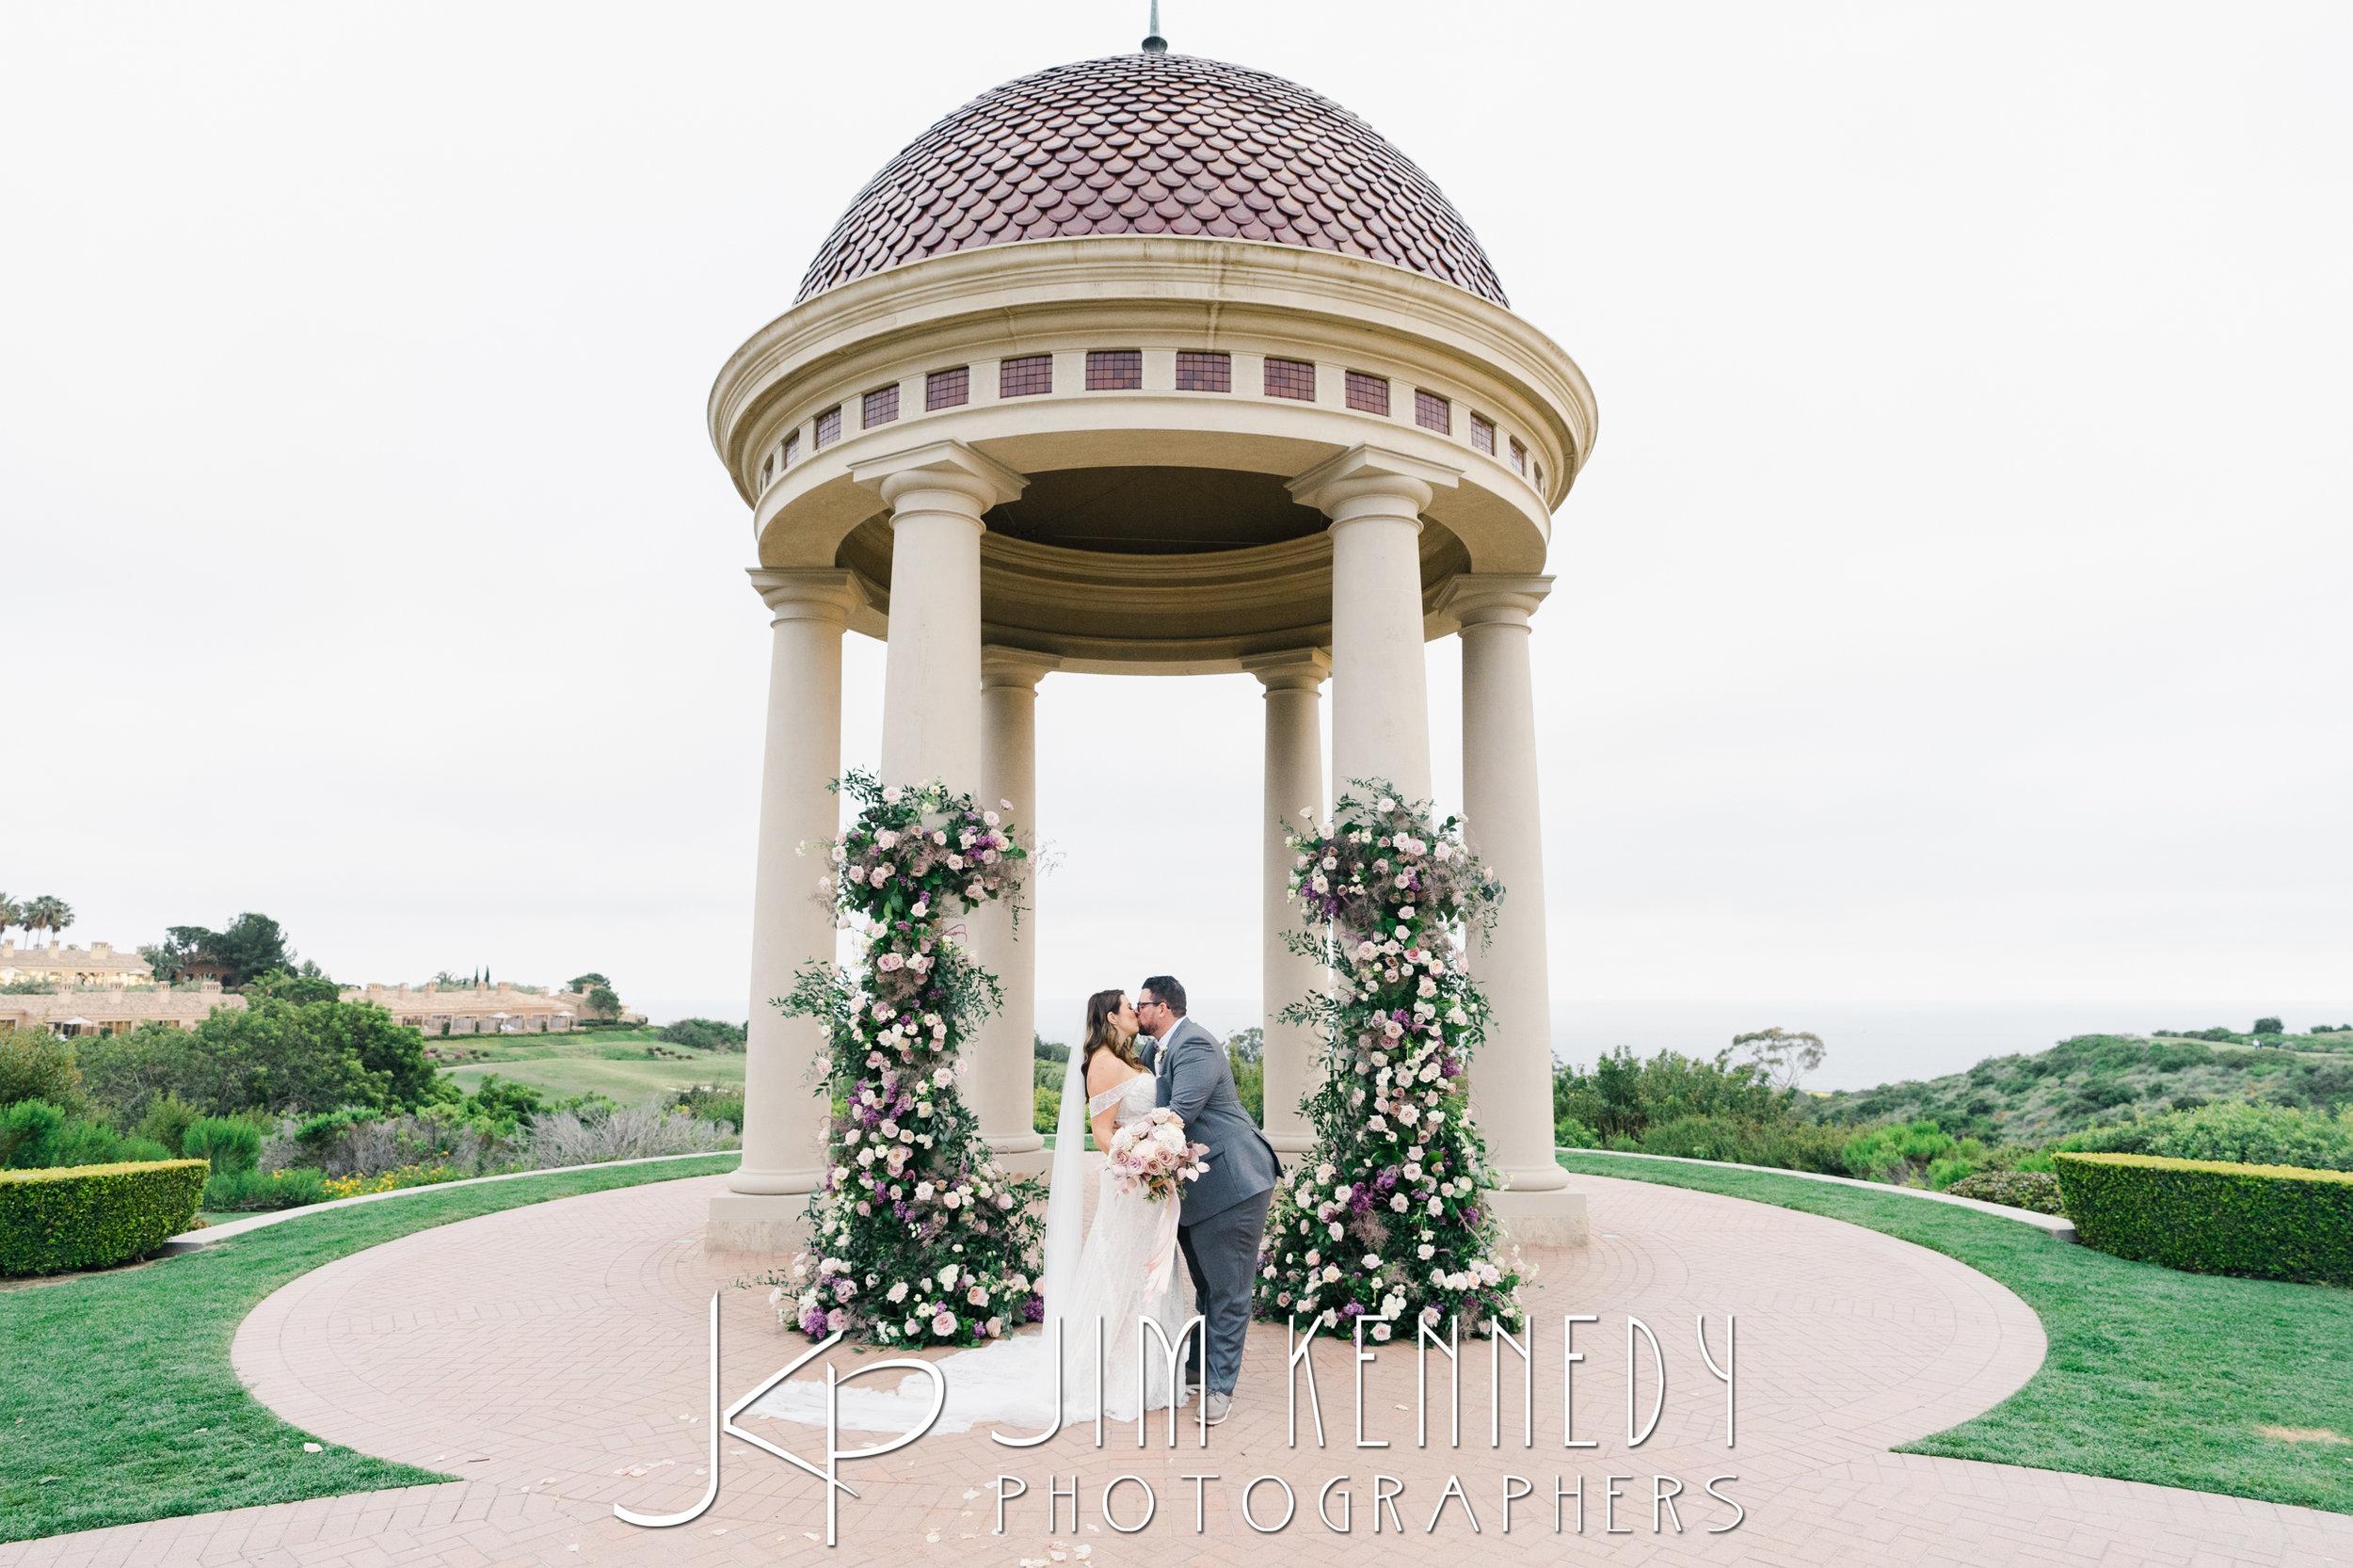 pelican-hill-wedding-jim-kenedy-photographers_0166.JPG